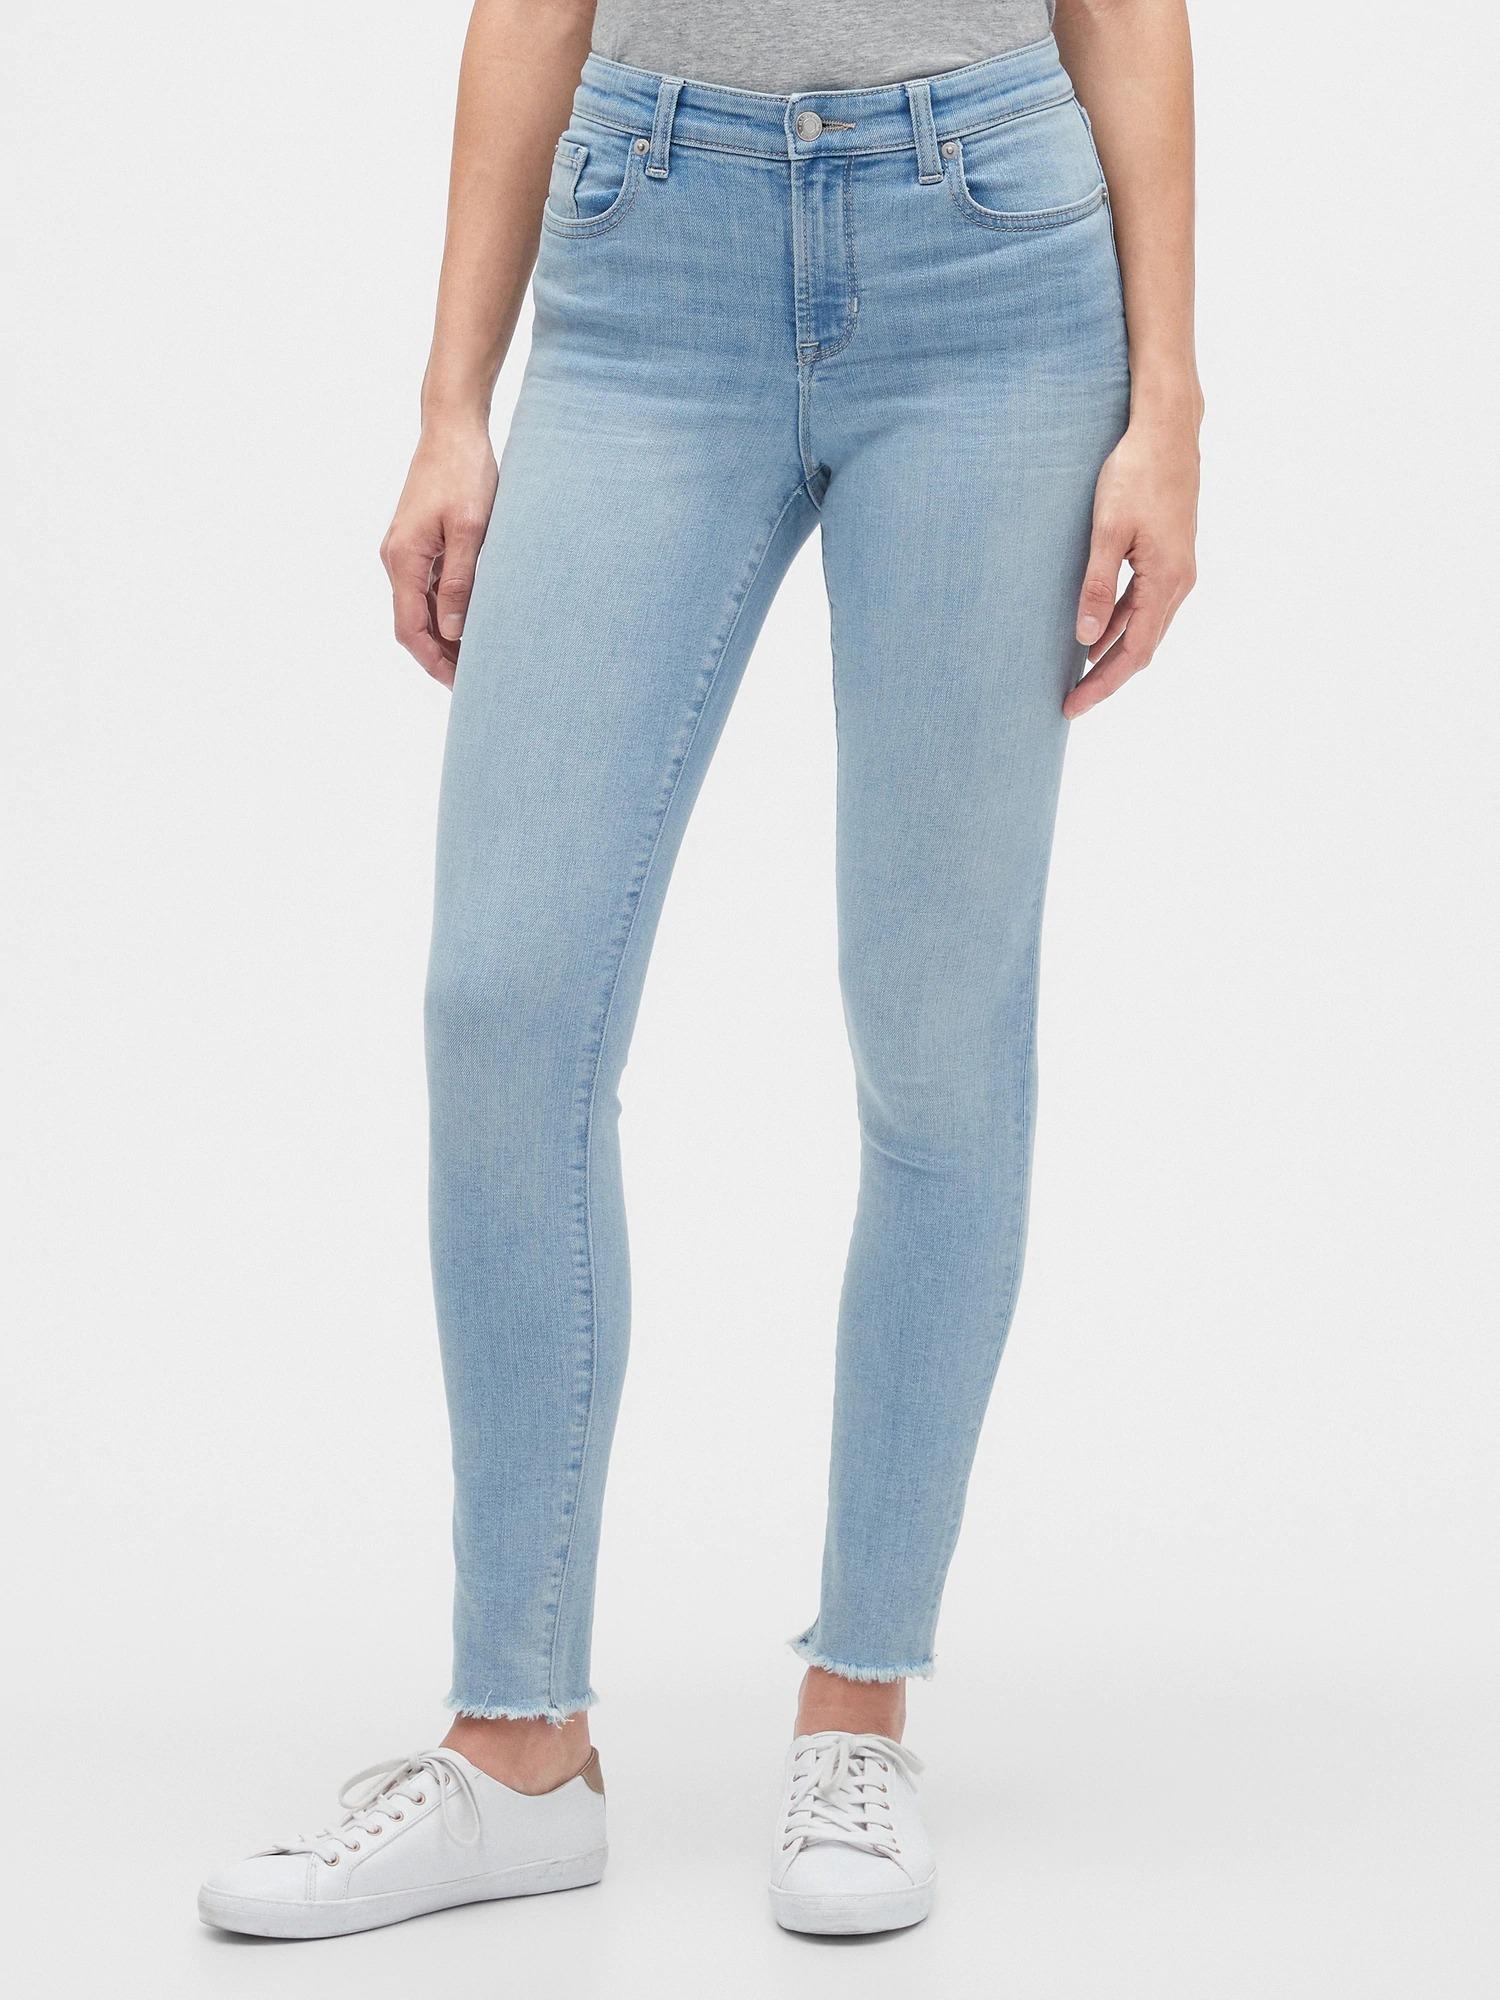 GAP Mavi Mid Rise Legging Skimmer Jean Pantolon